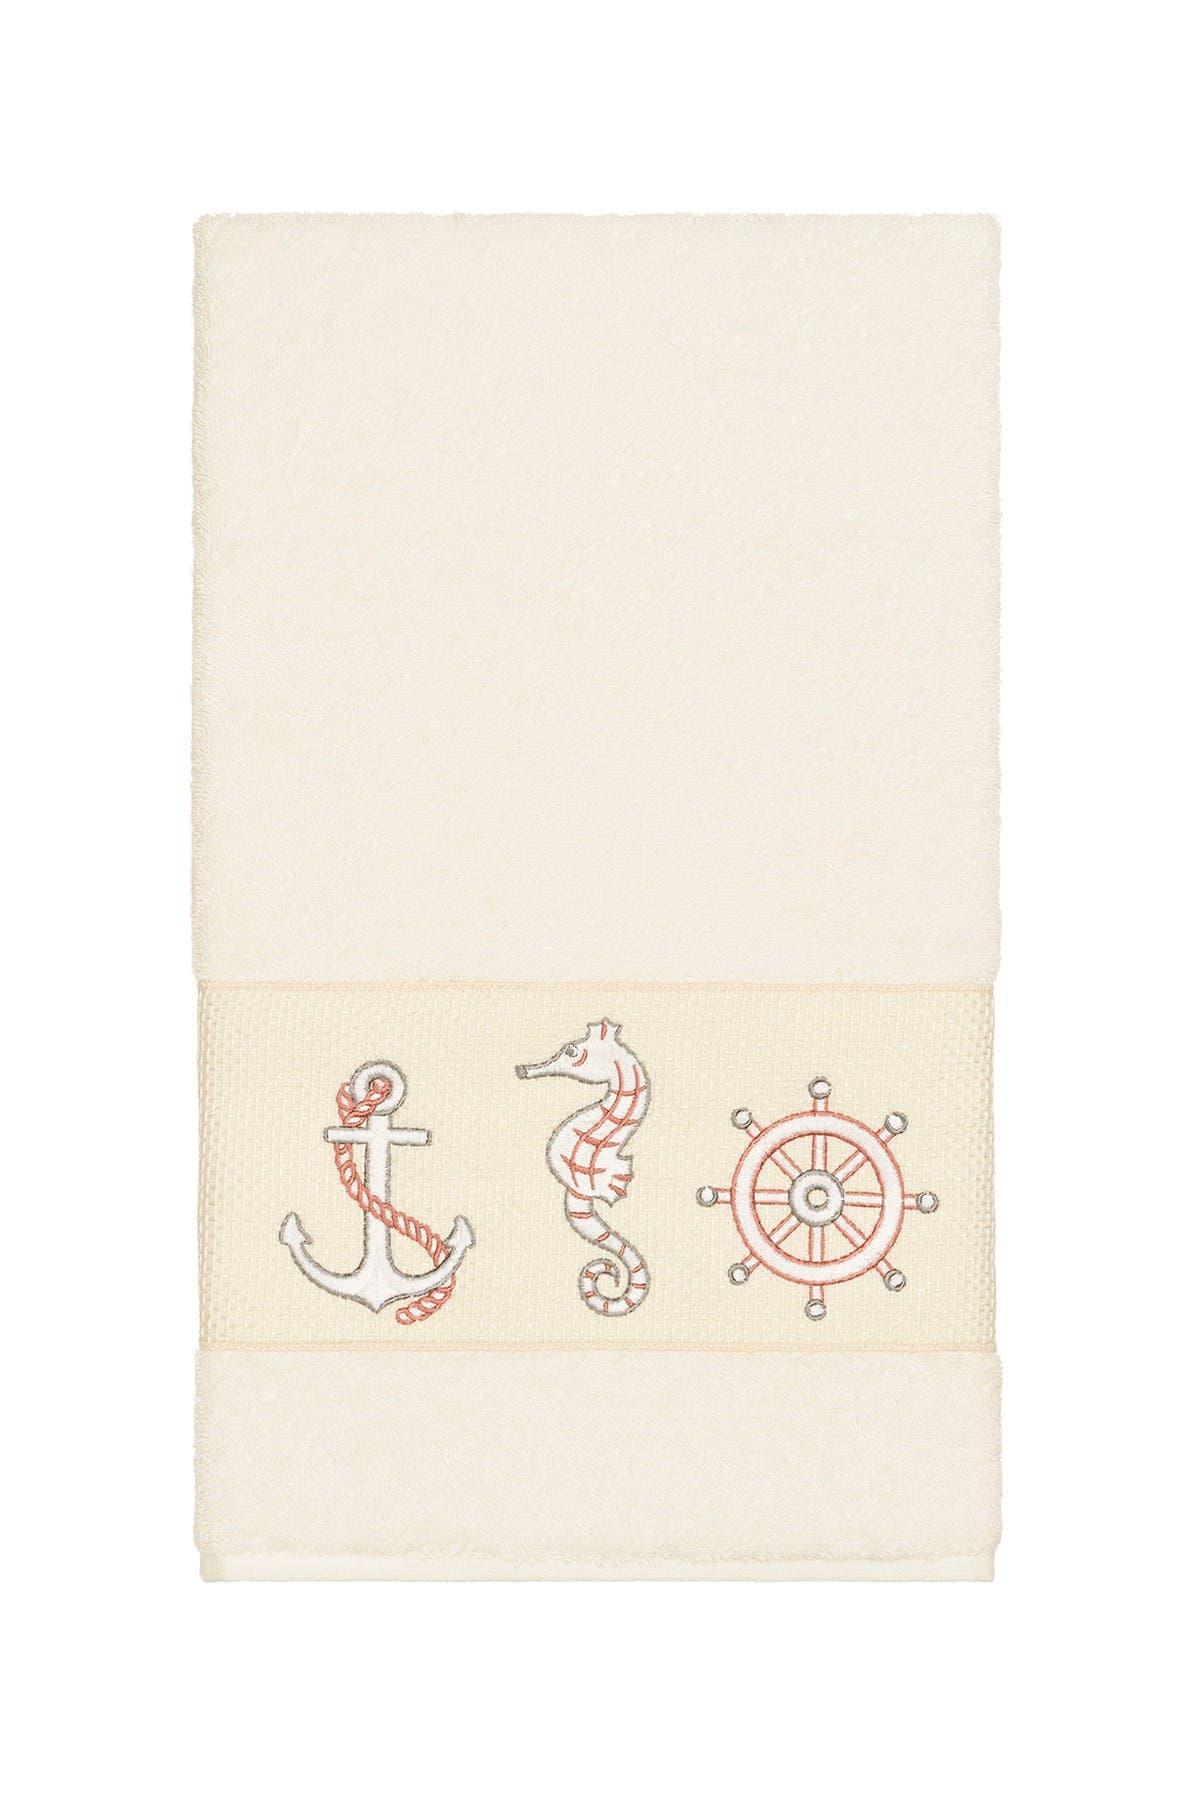 Image of LINUM HOME Easton 3-Piece Embellished Towel - Cream